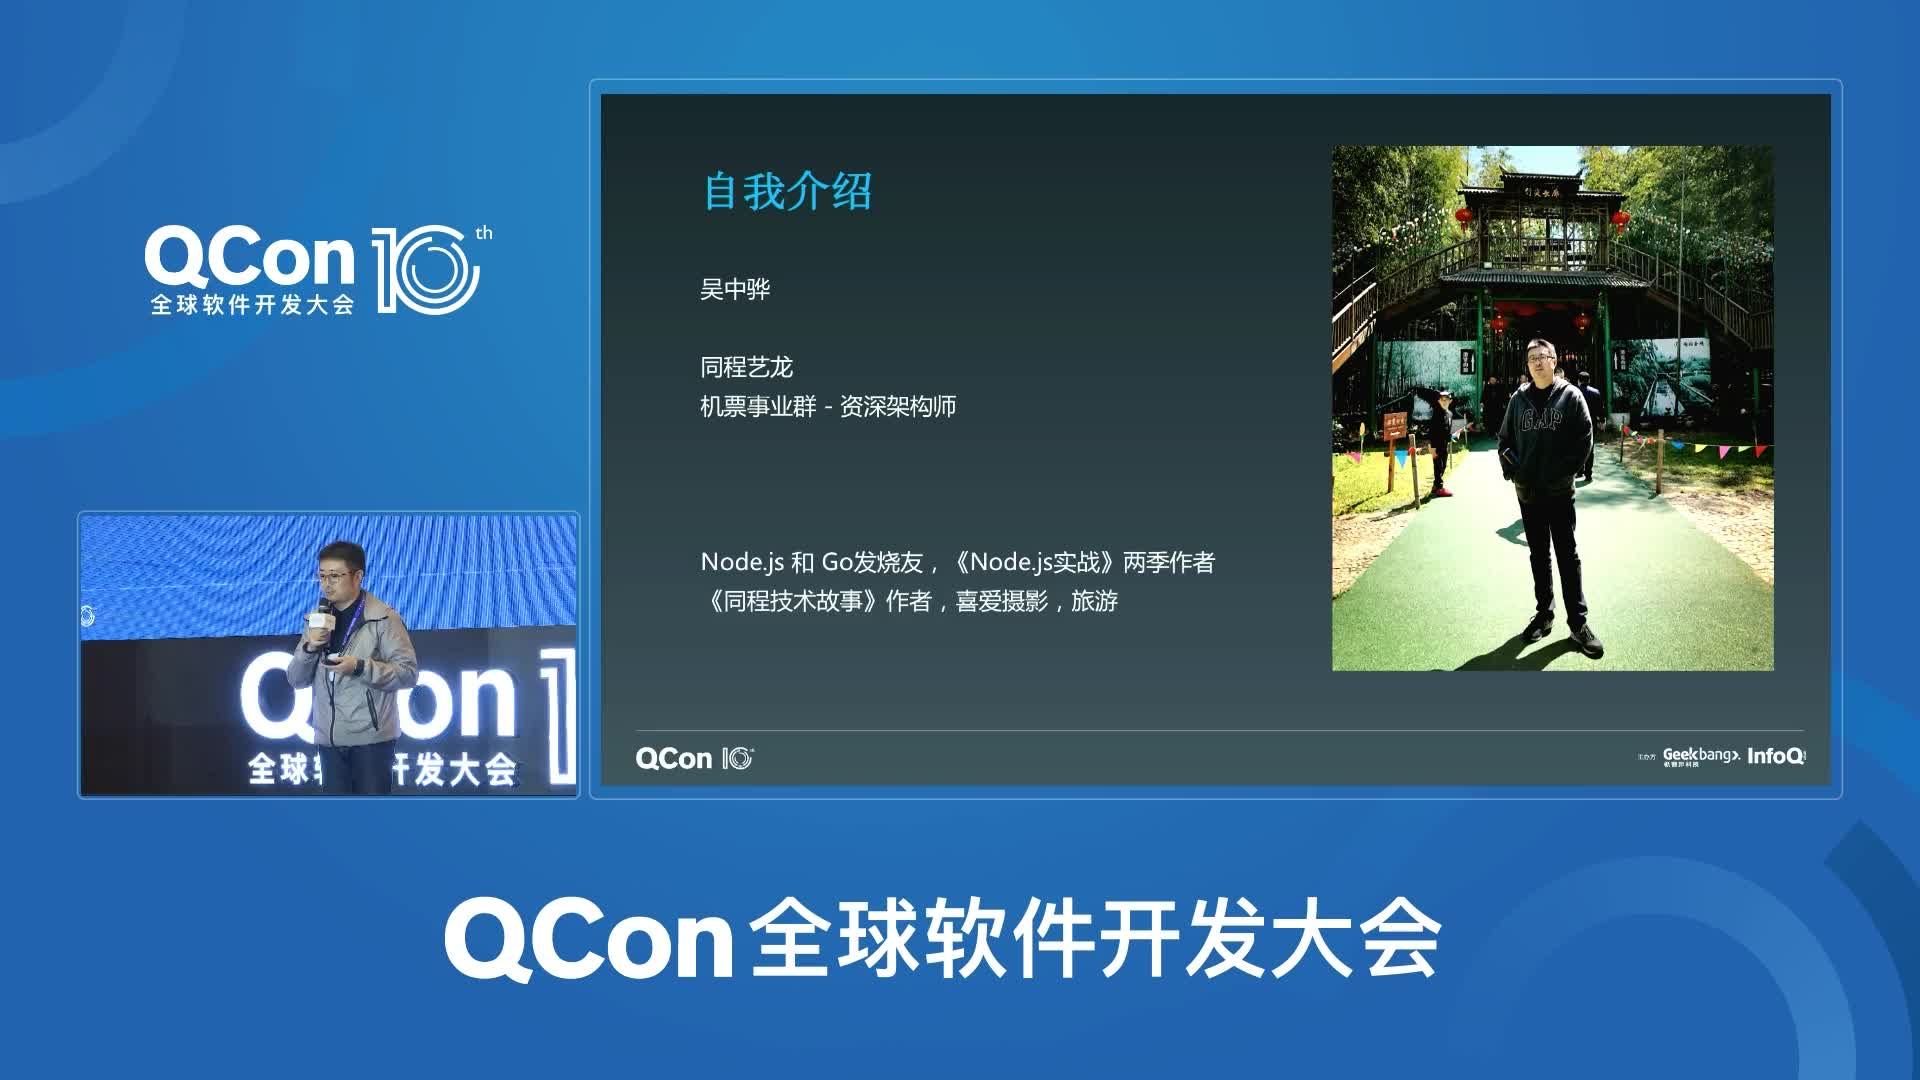 基于 OpenResty 打造业务融合网关 | QCon